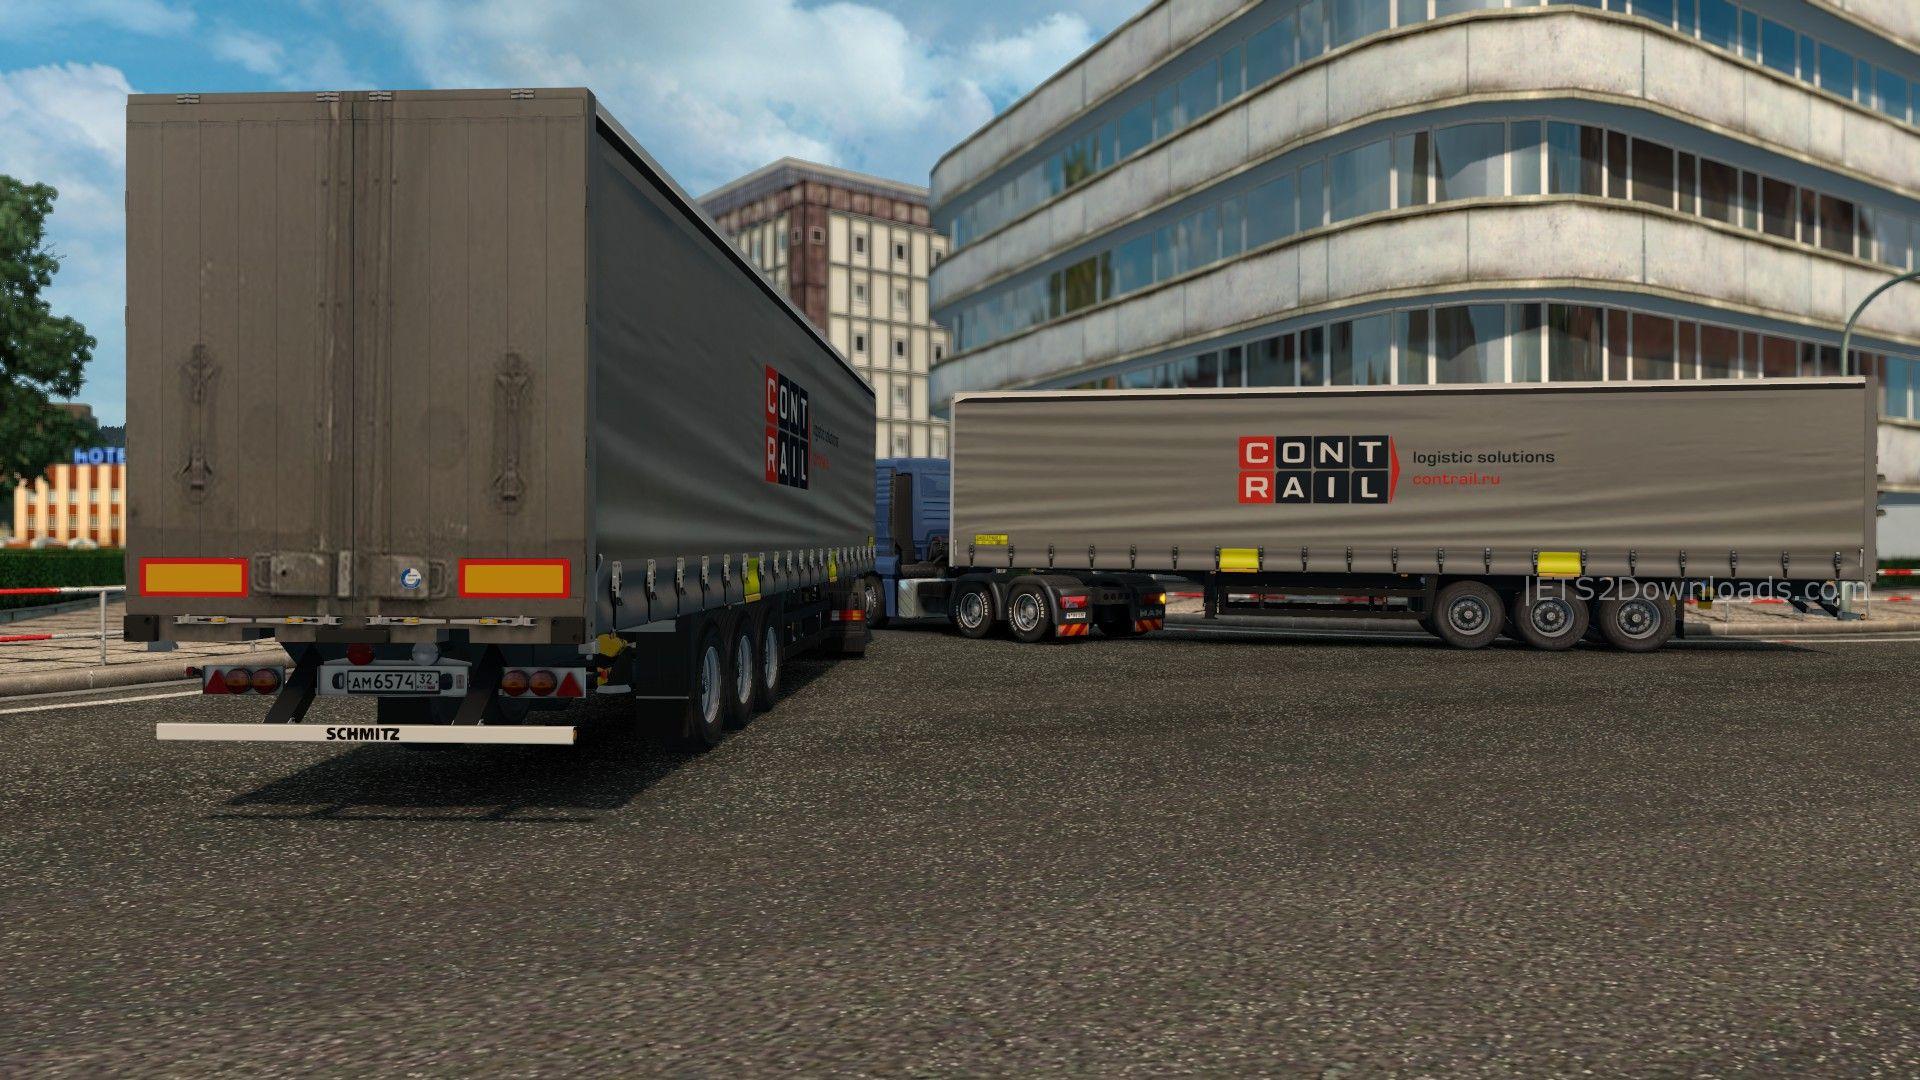 cont-rail-trailer